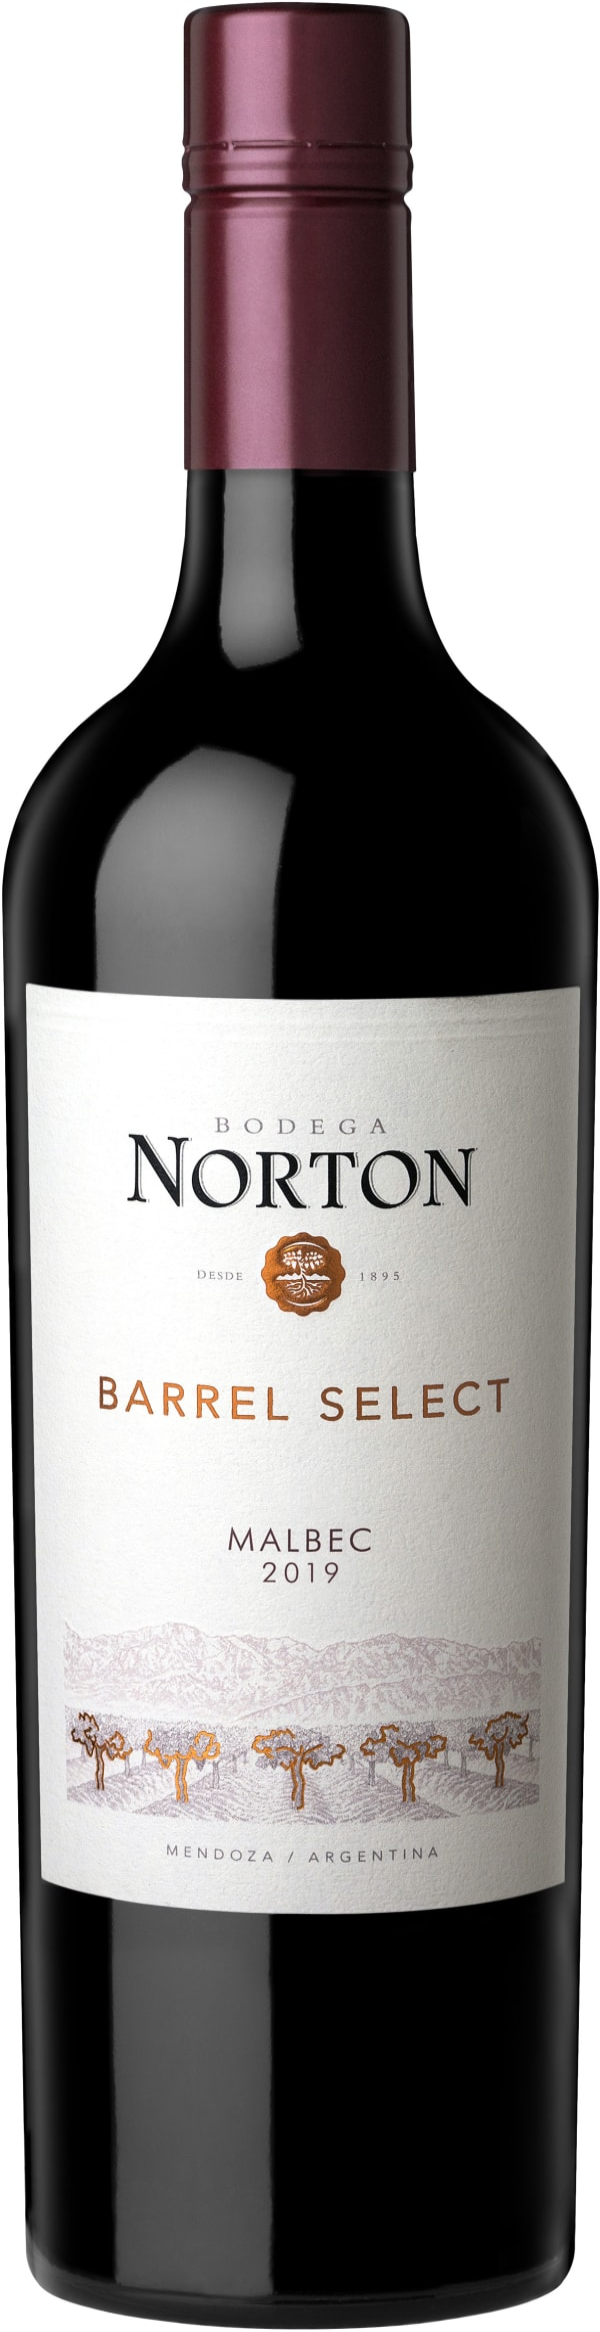 Norton Barrel Select Malbec 2015